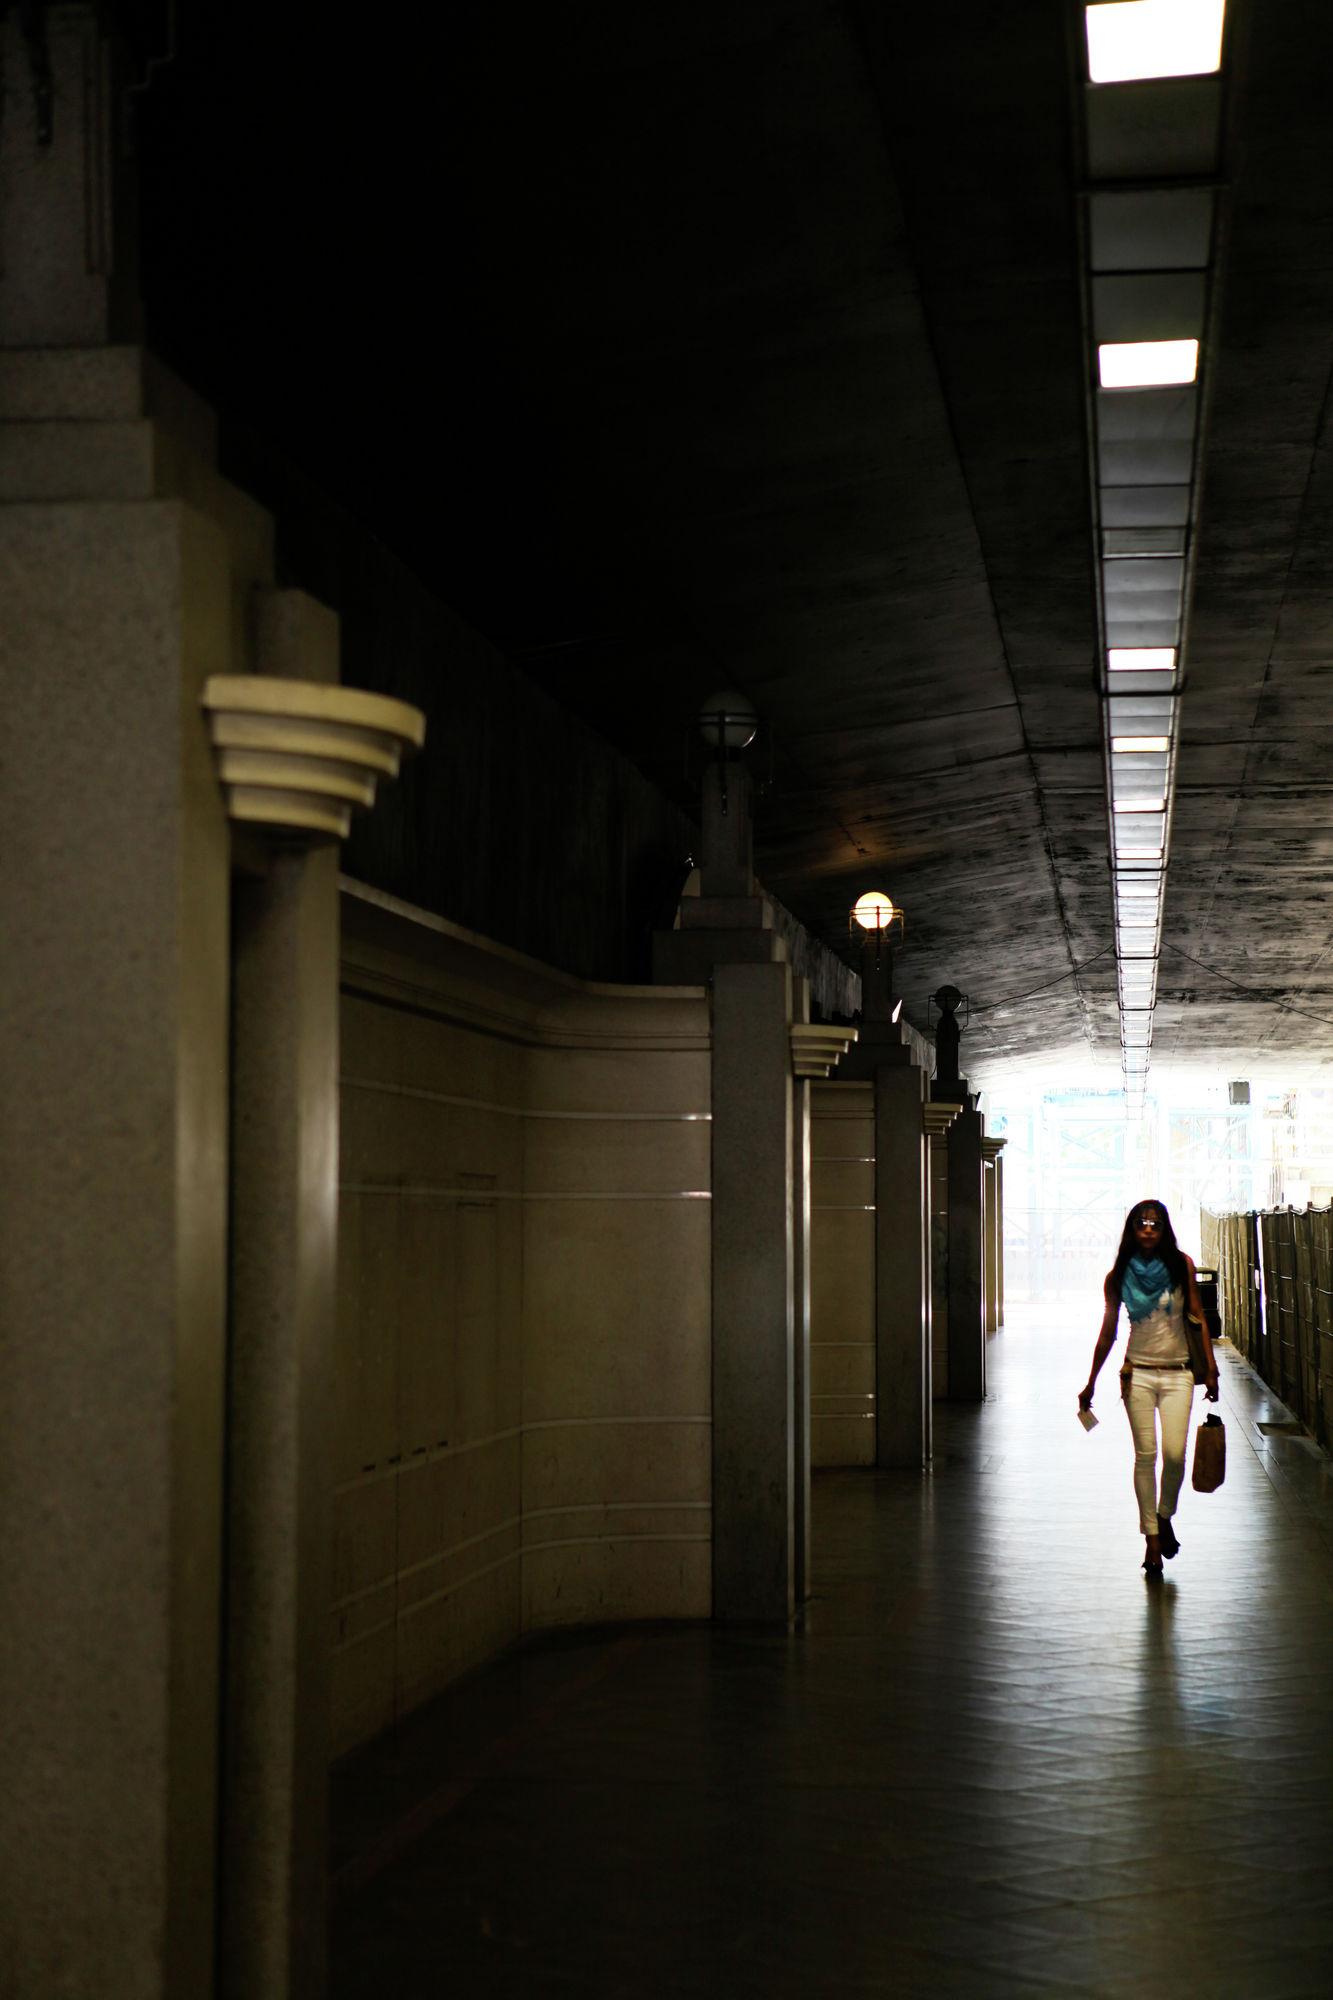 gent sint-pieters tramtunnel©Layla Aerts.jpg